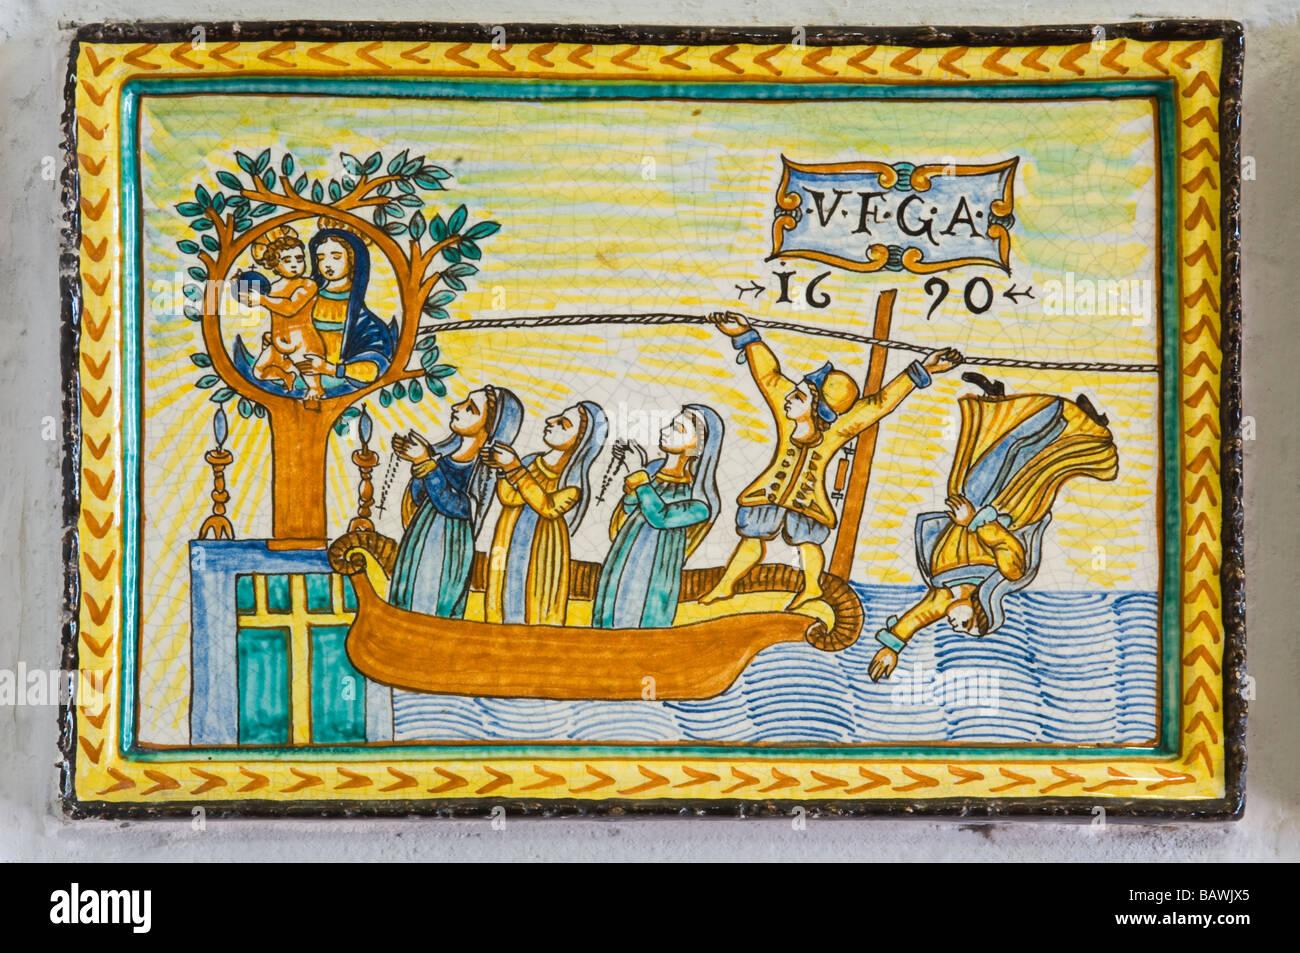 Santuario madonna dei bagni ex voto deruta umbria italy for Deghi bagni